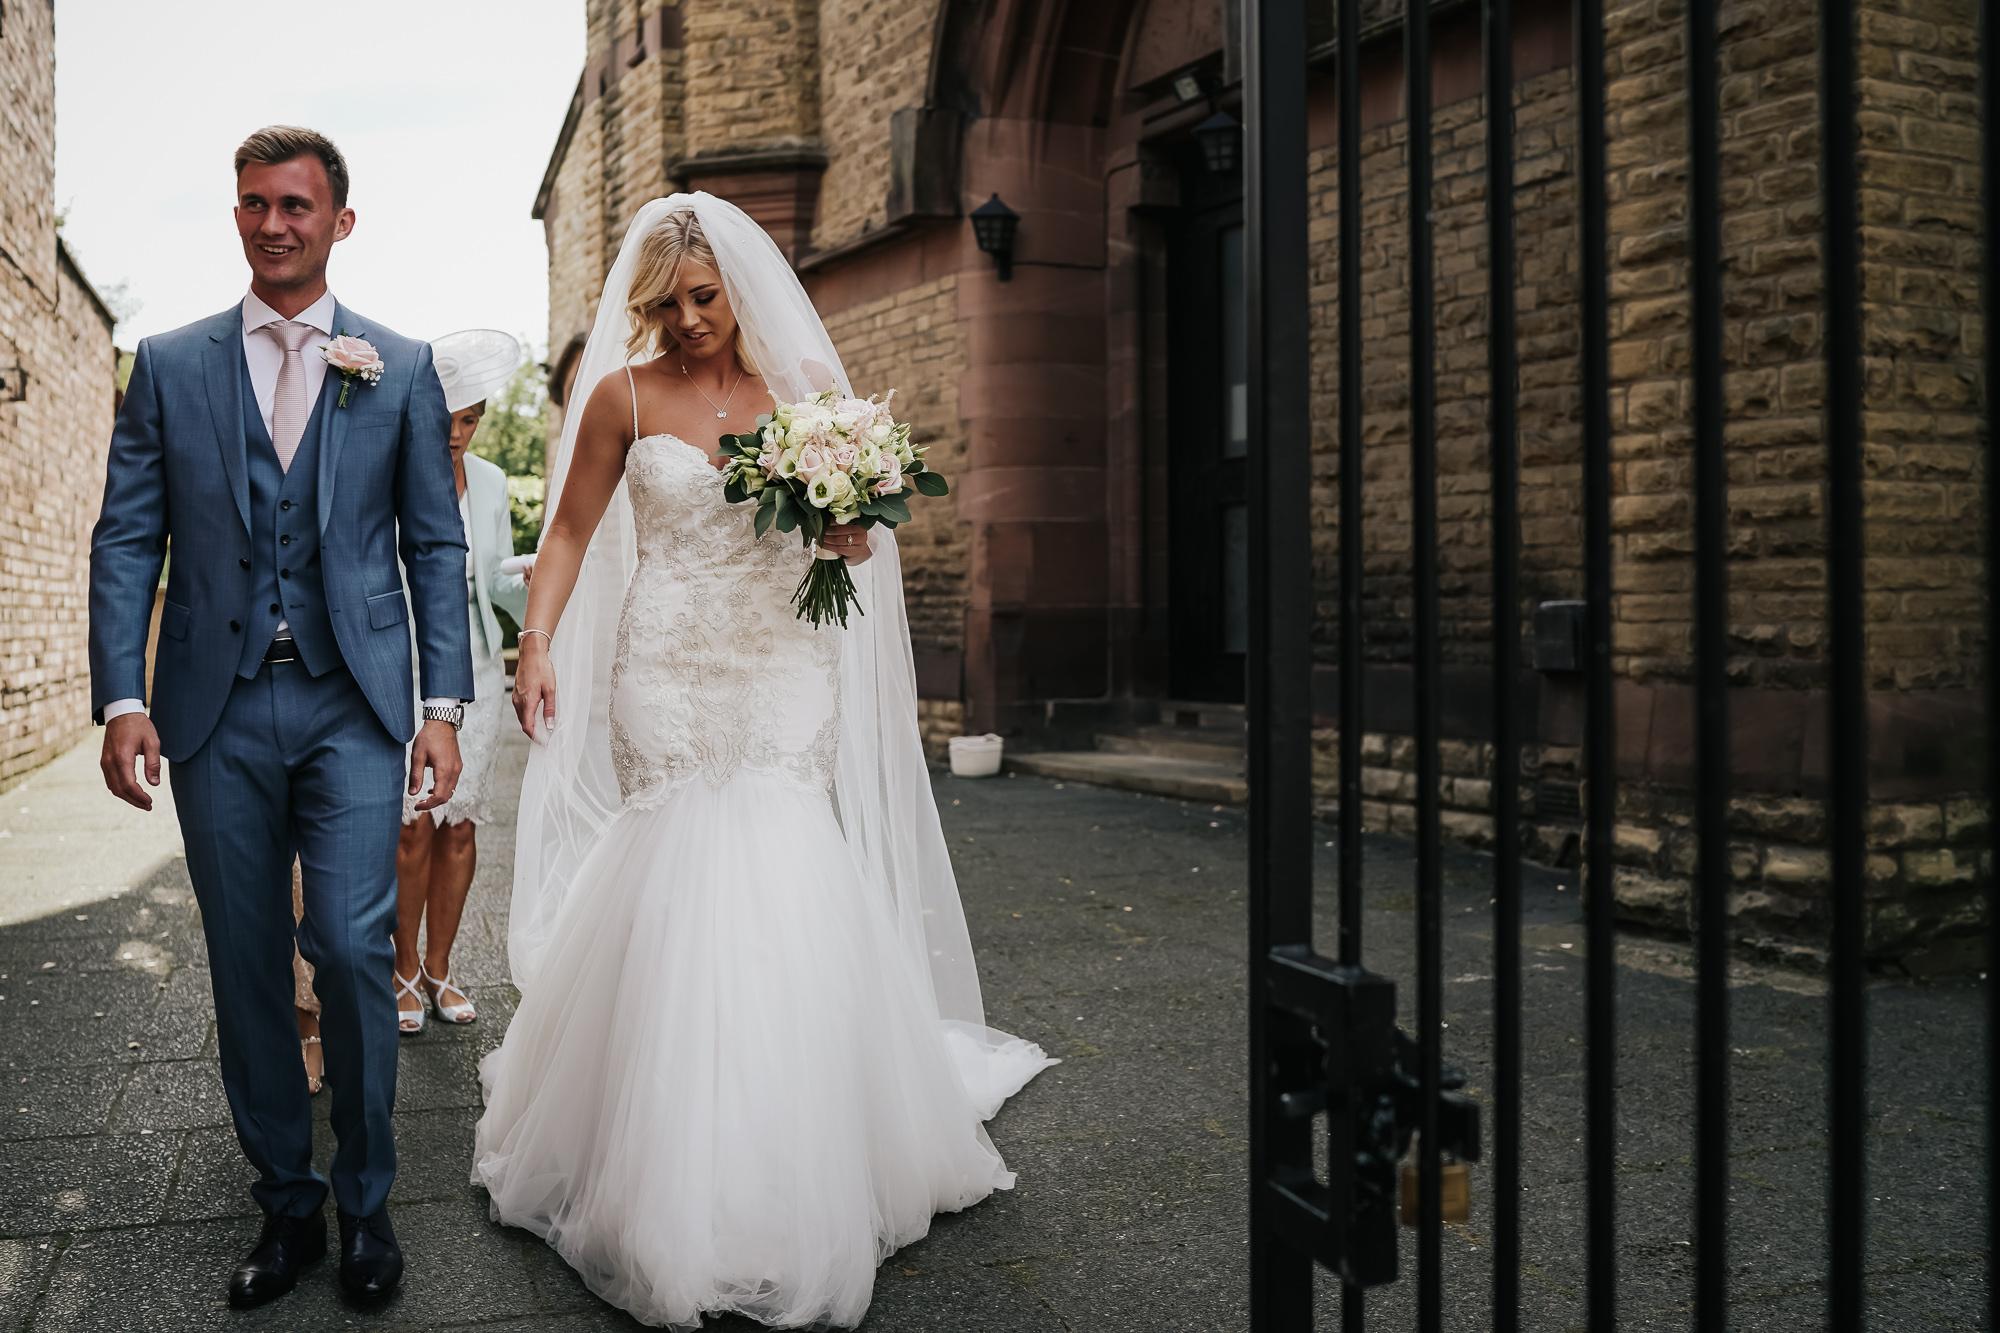 Thornton Manor Lakeside Marquee Wedding Photographer  (29 of 53).jpg